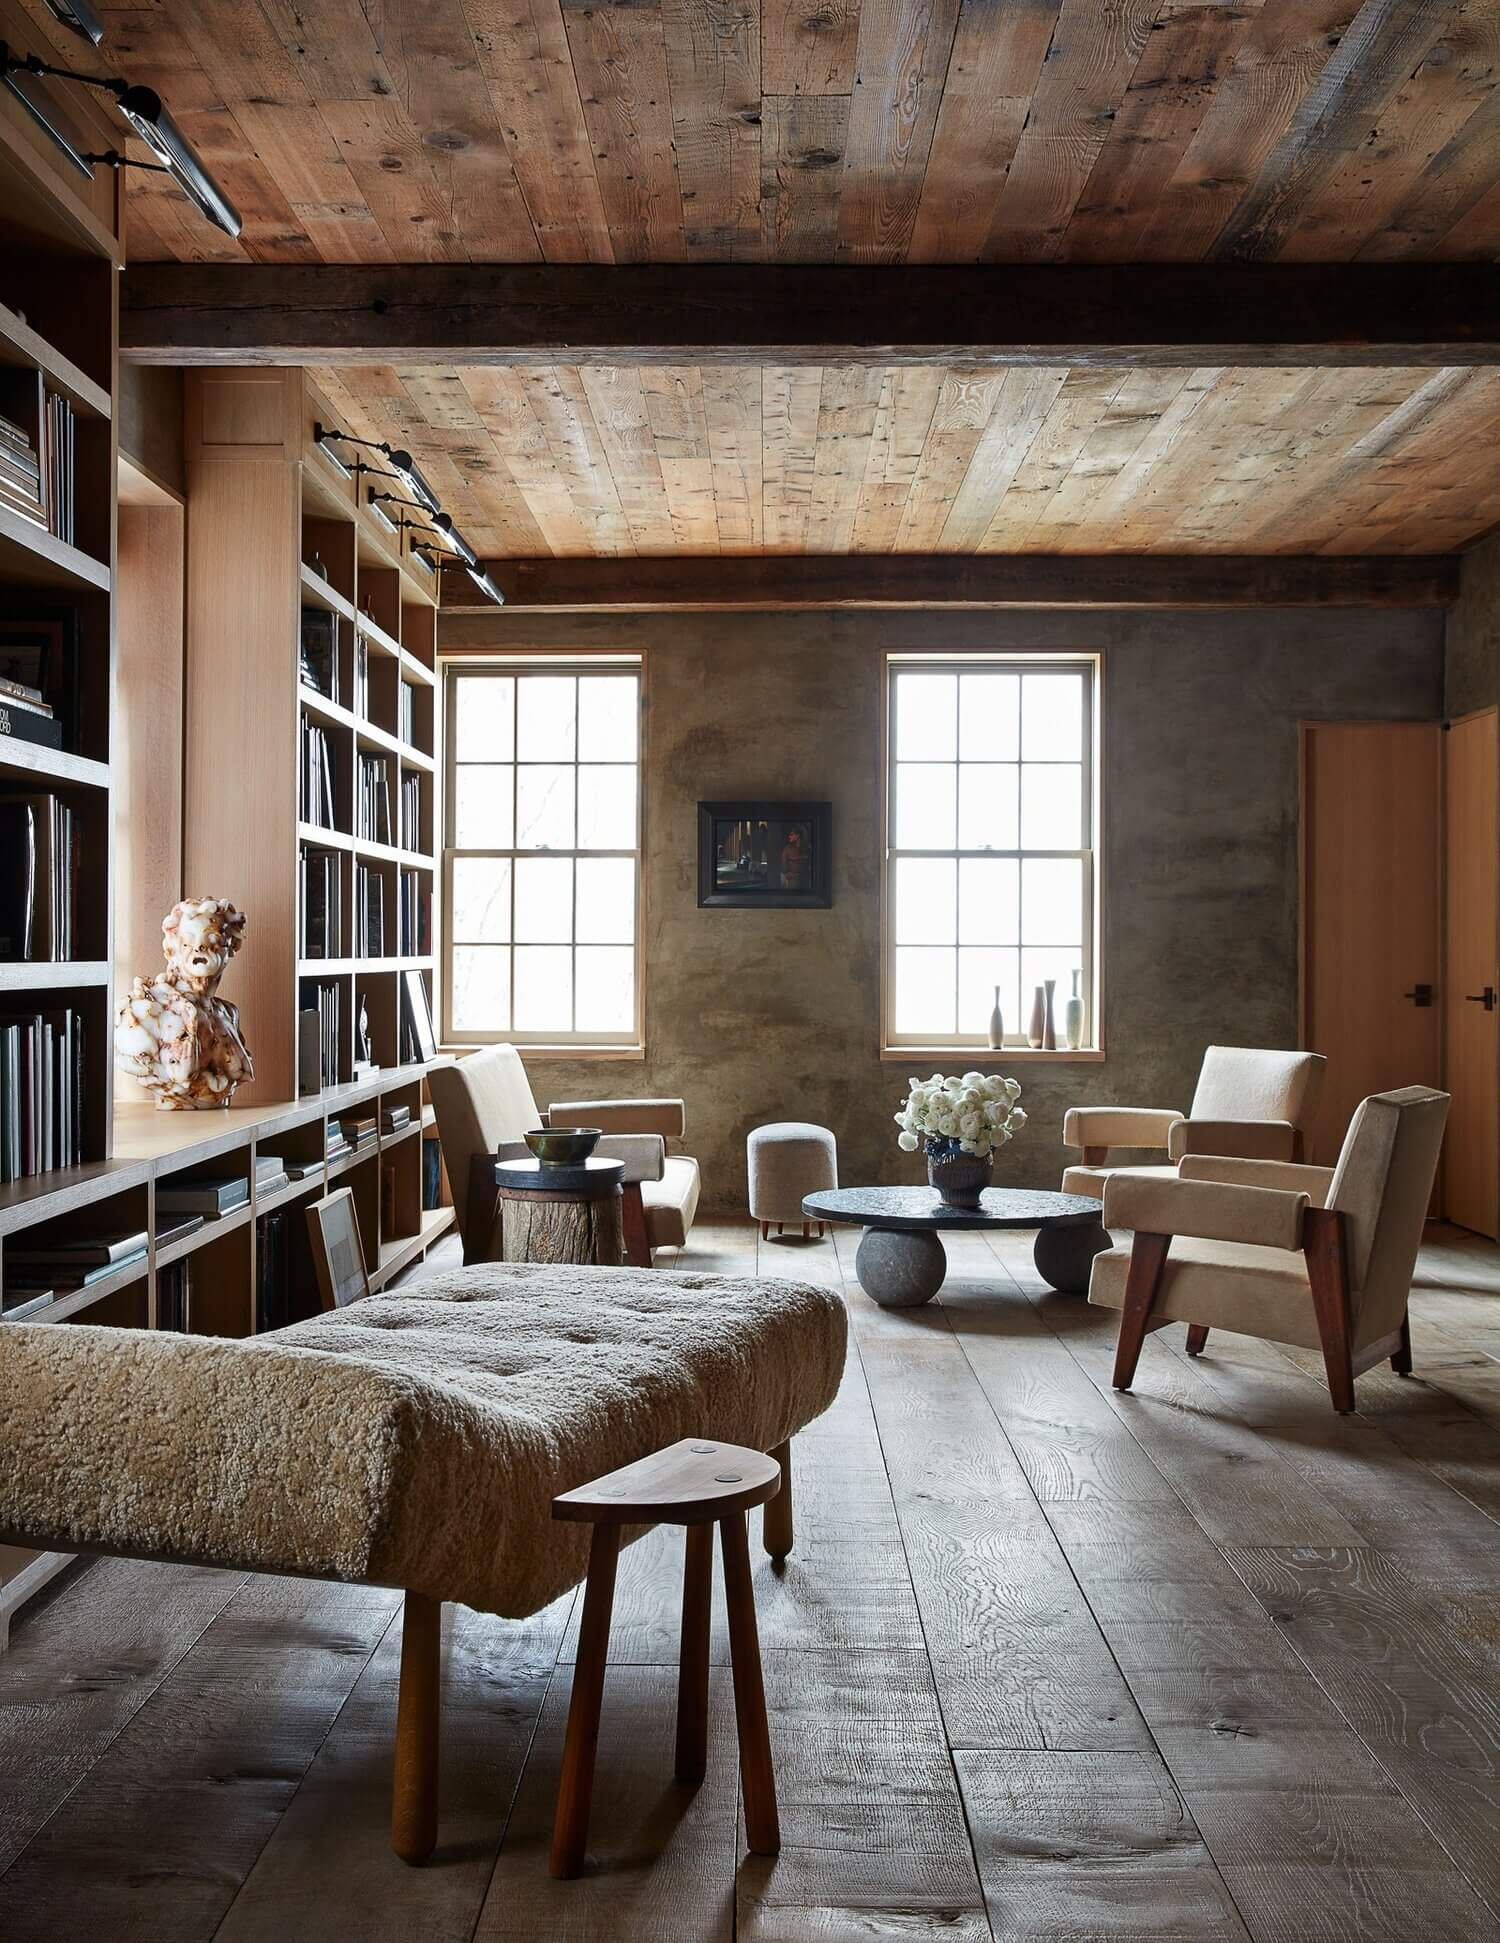 Ryan Murphy's Warm Wooden Home in New York City